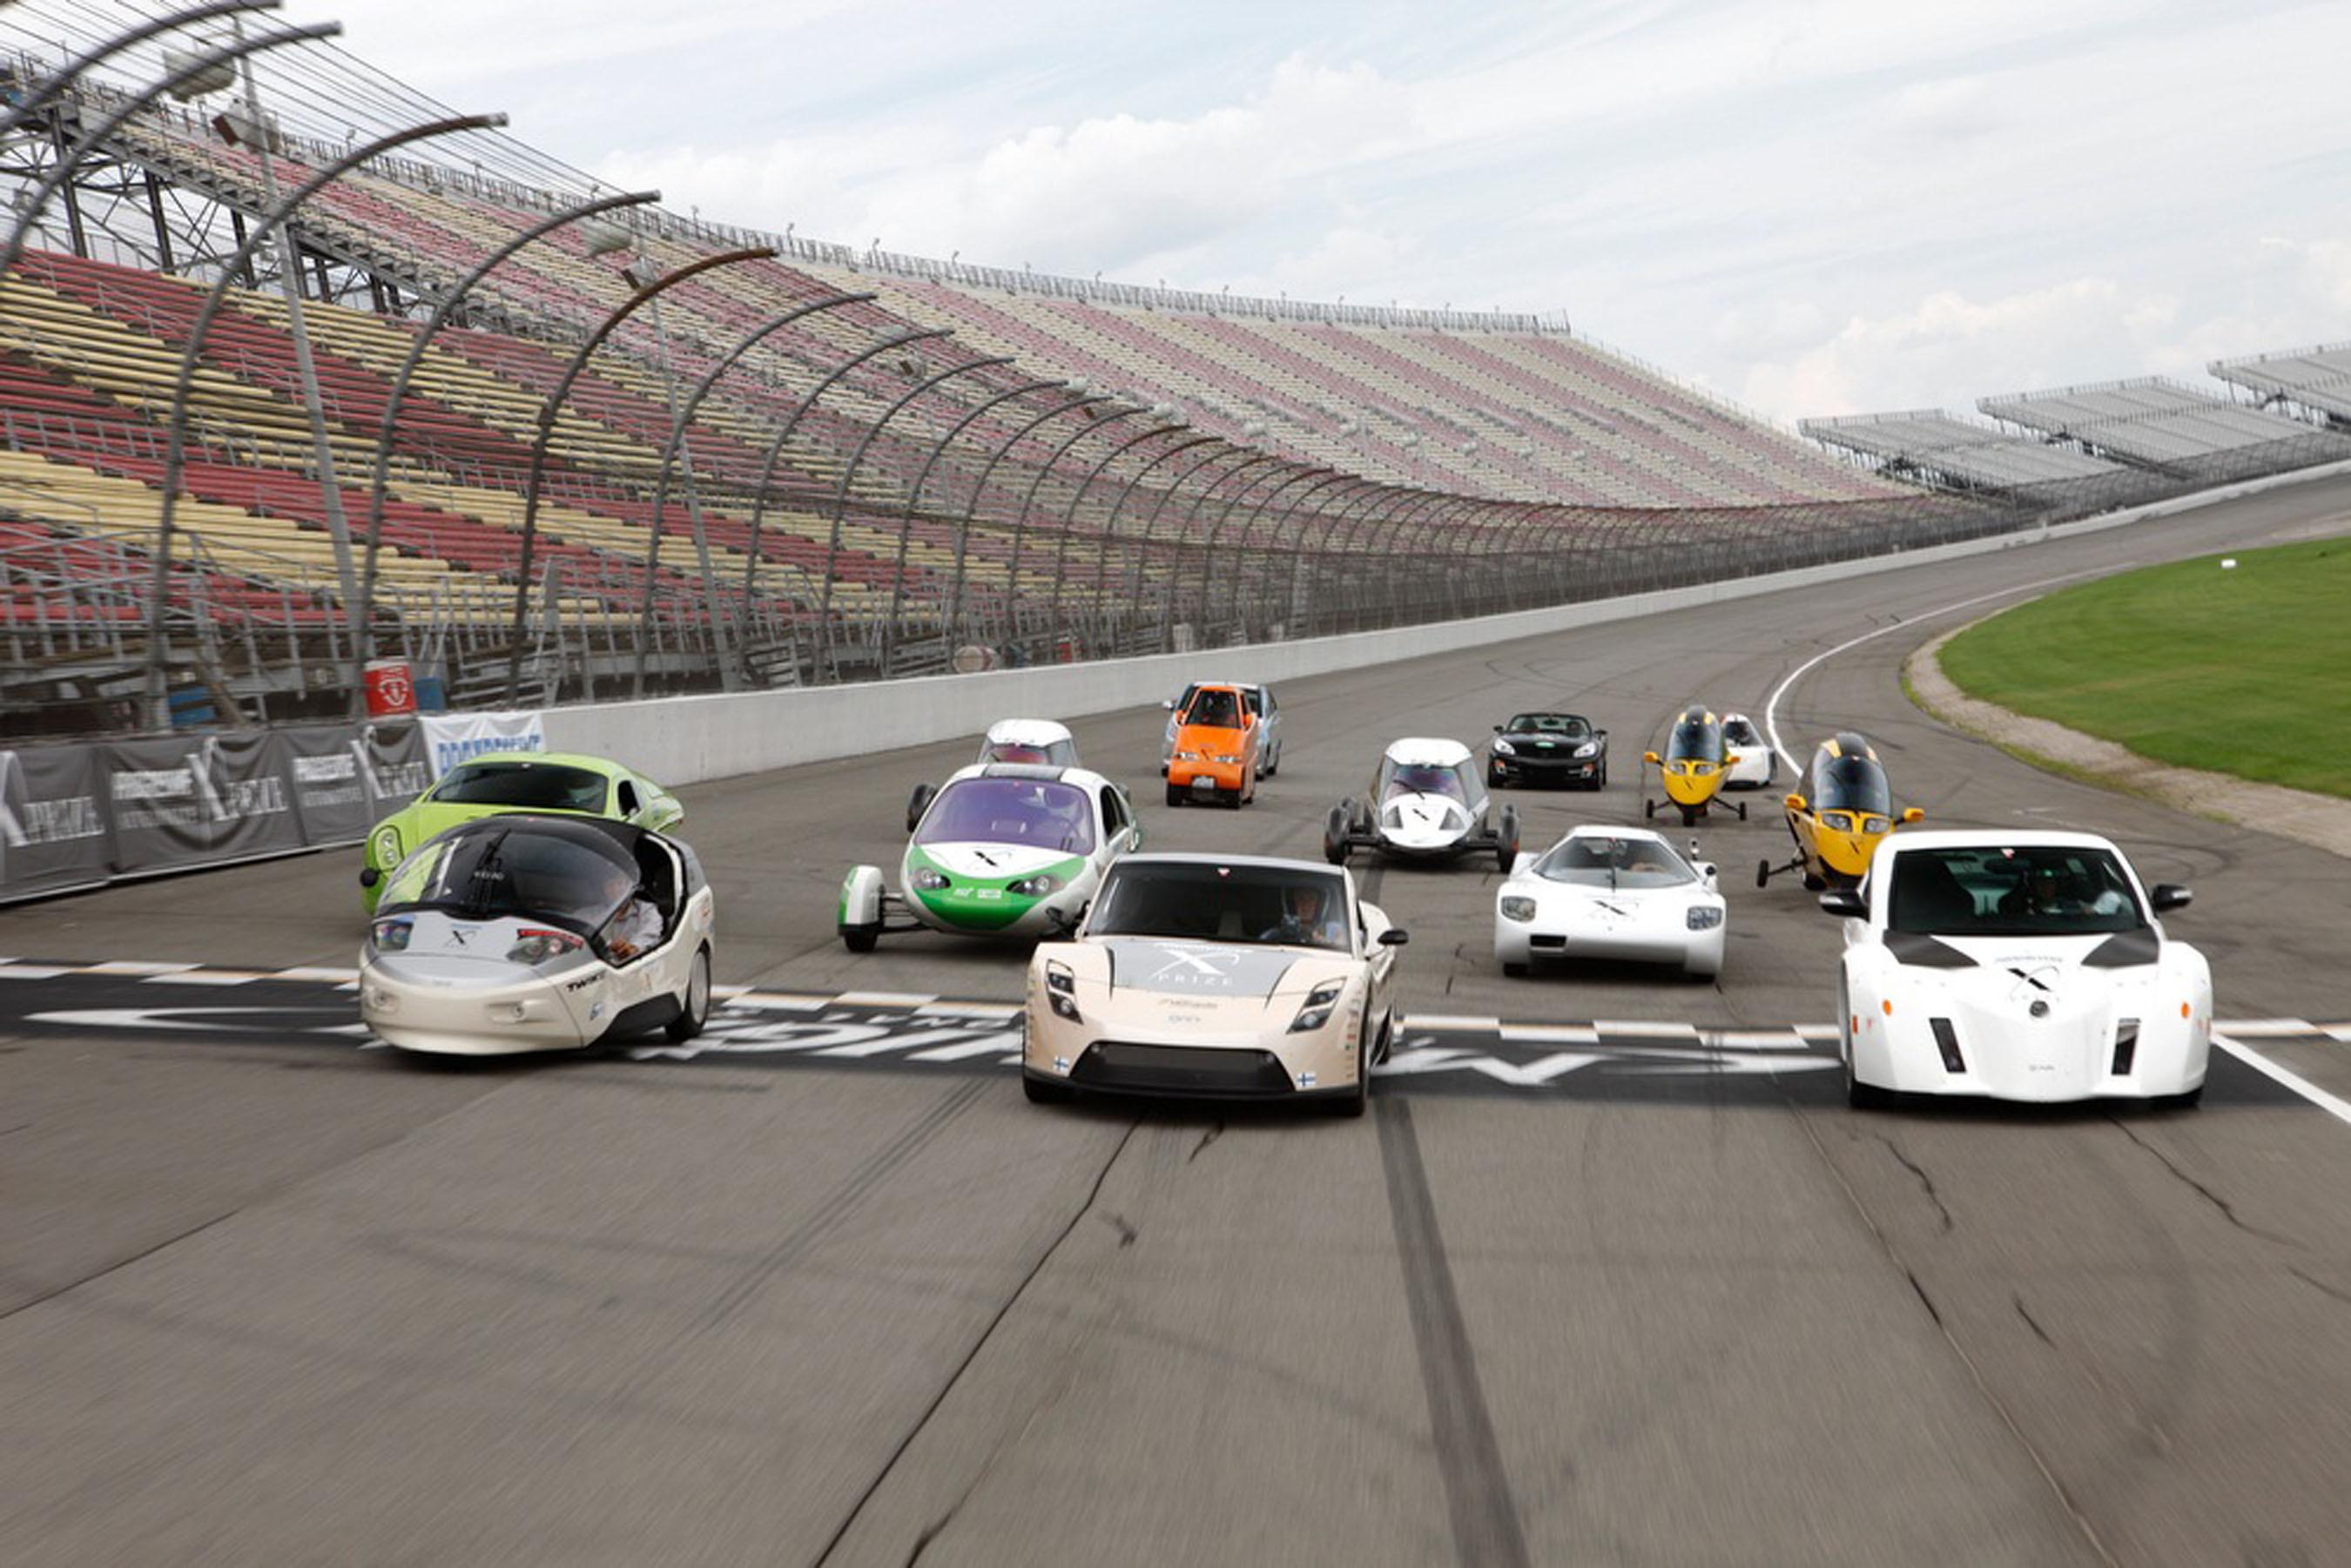 Three super-mileage winners announced for Automotive X Prize